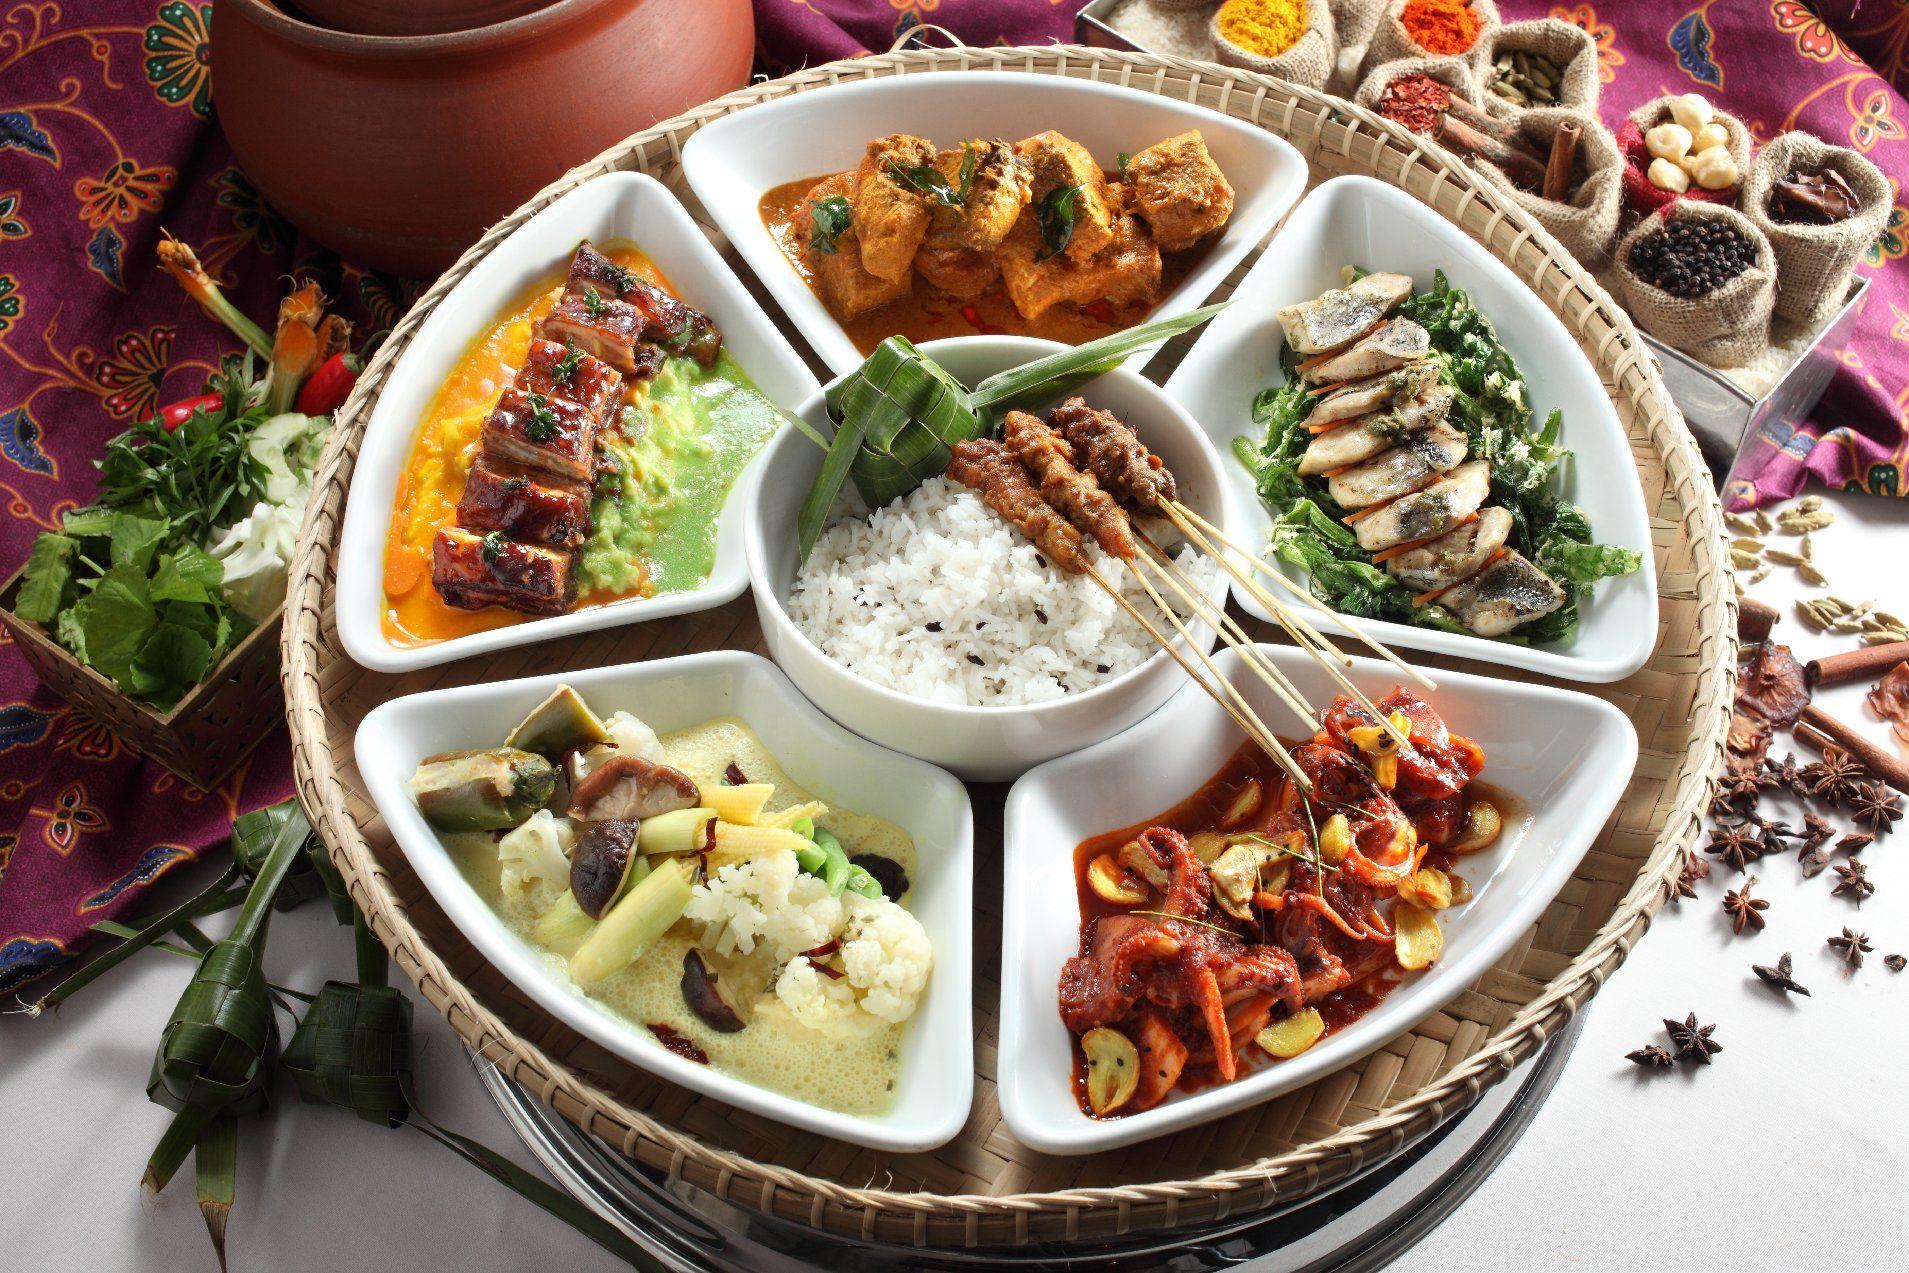 Ramadhan buffet #hotel #travel #5starhotel #destination #travelingideas #holiday #ramadhan #hariraya